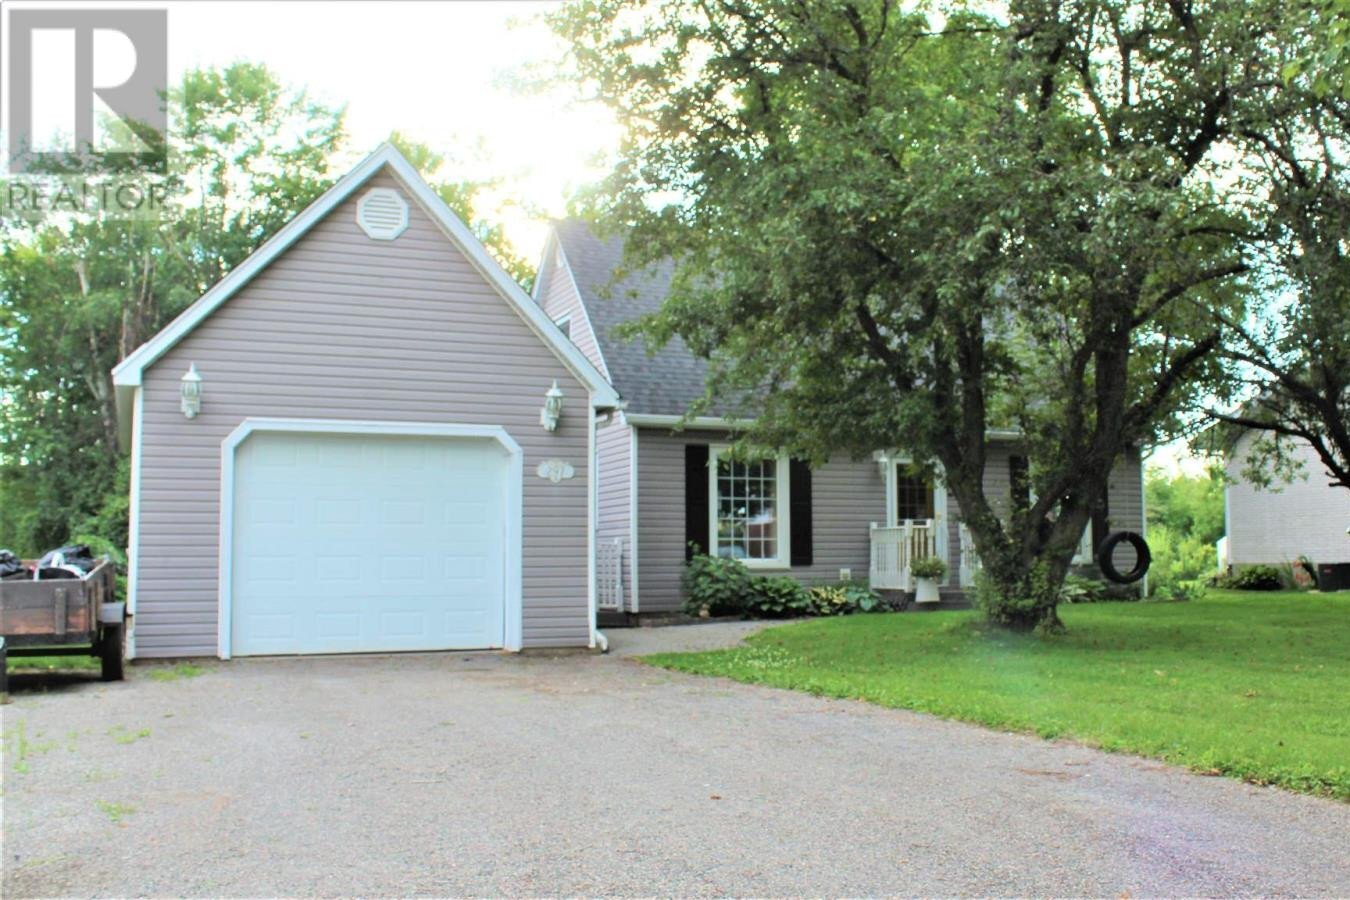 House for sale at 297 Reid St. Sault Ste. Marie Ontario - MLS: SM129333